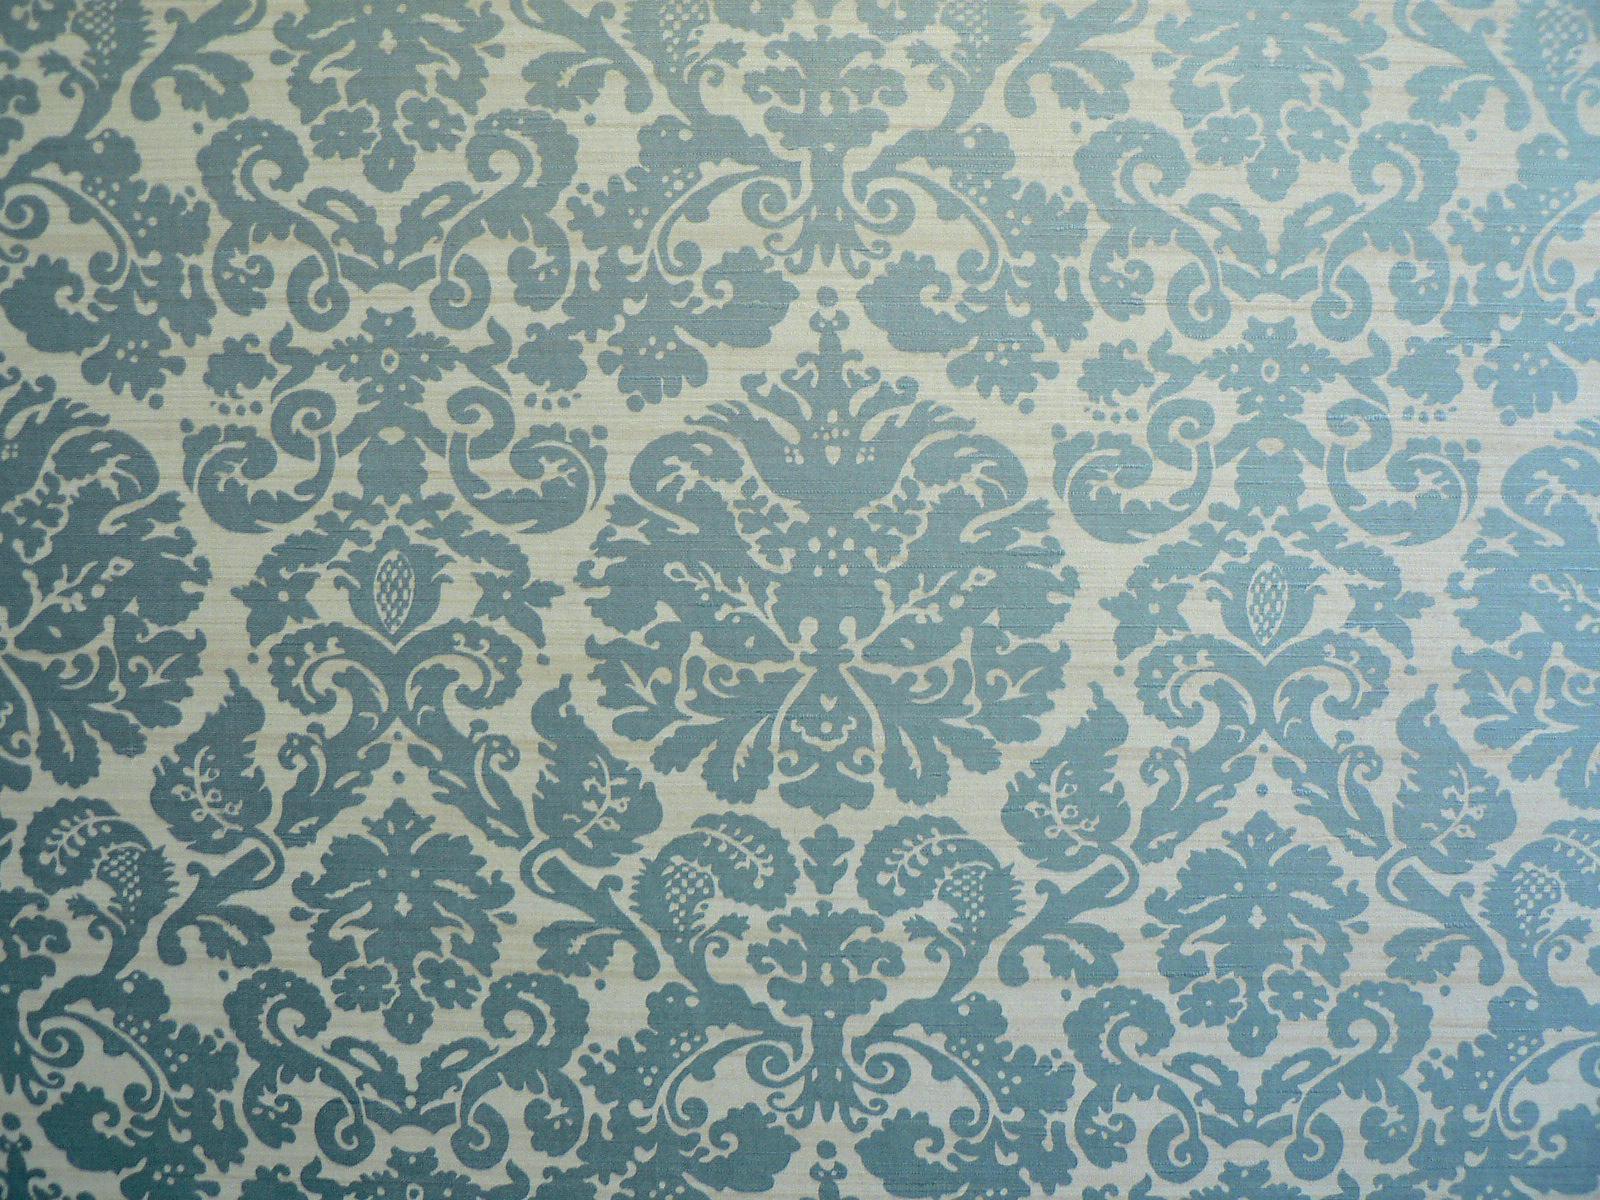 Free Texture Wallpaper